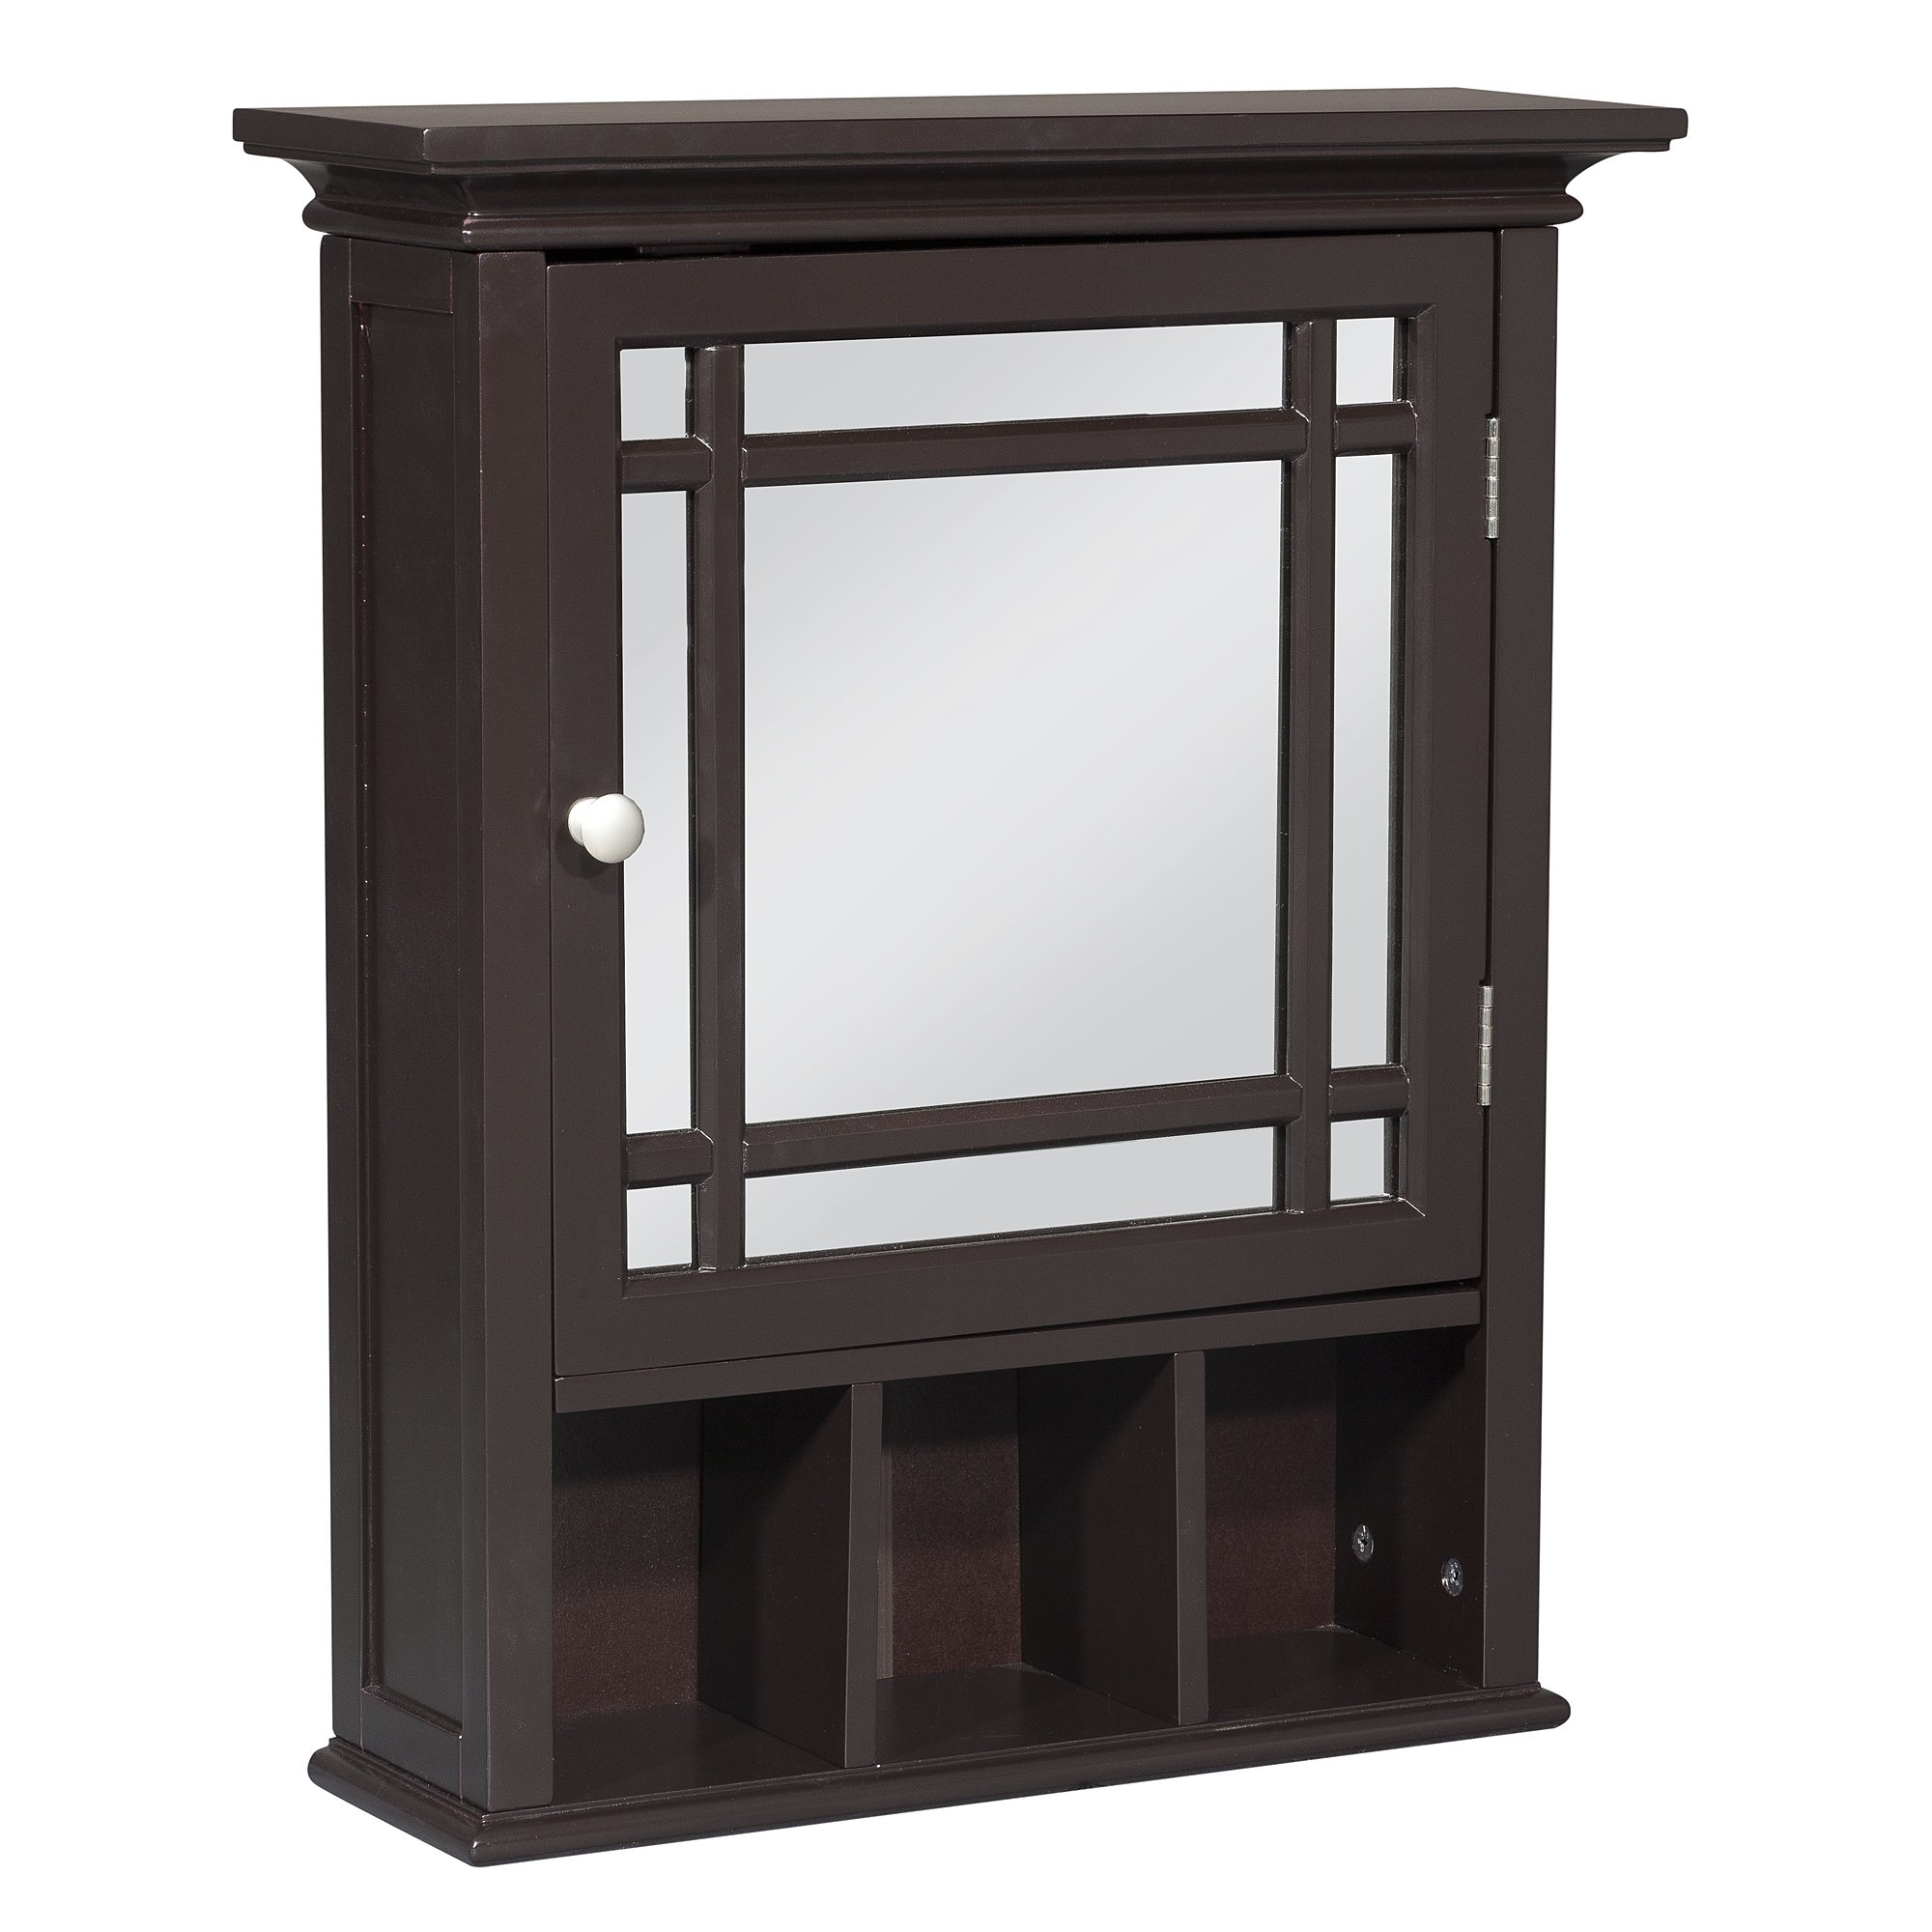 Elegant Home Fashion Neal Medicine Cabinet by Elegant Home Fashion (Image #4)